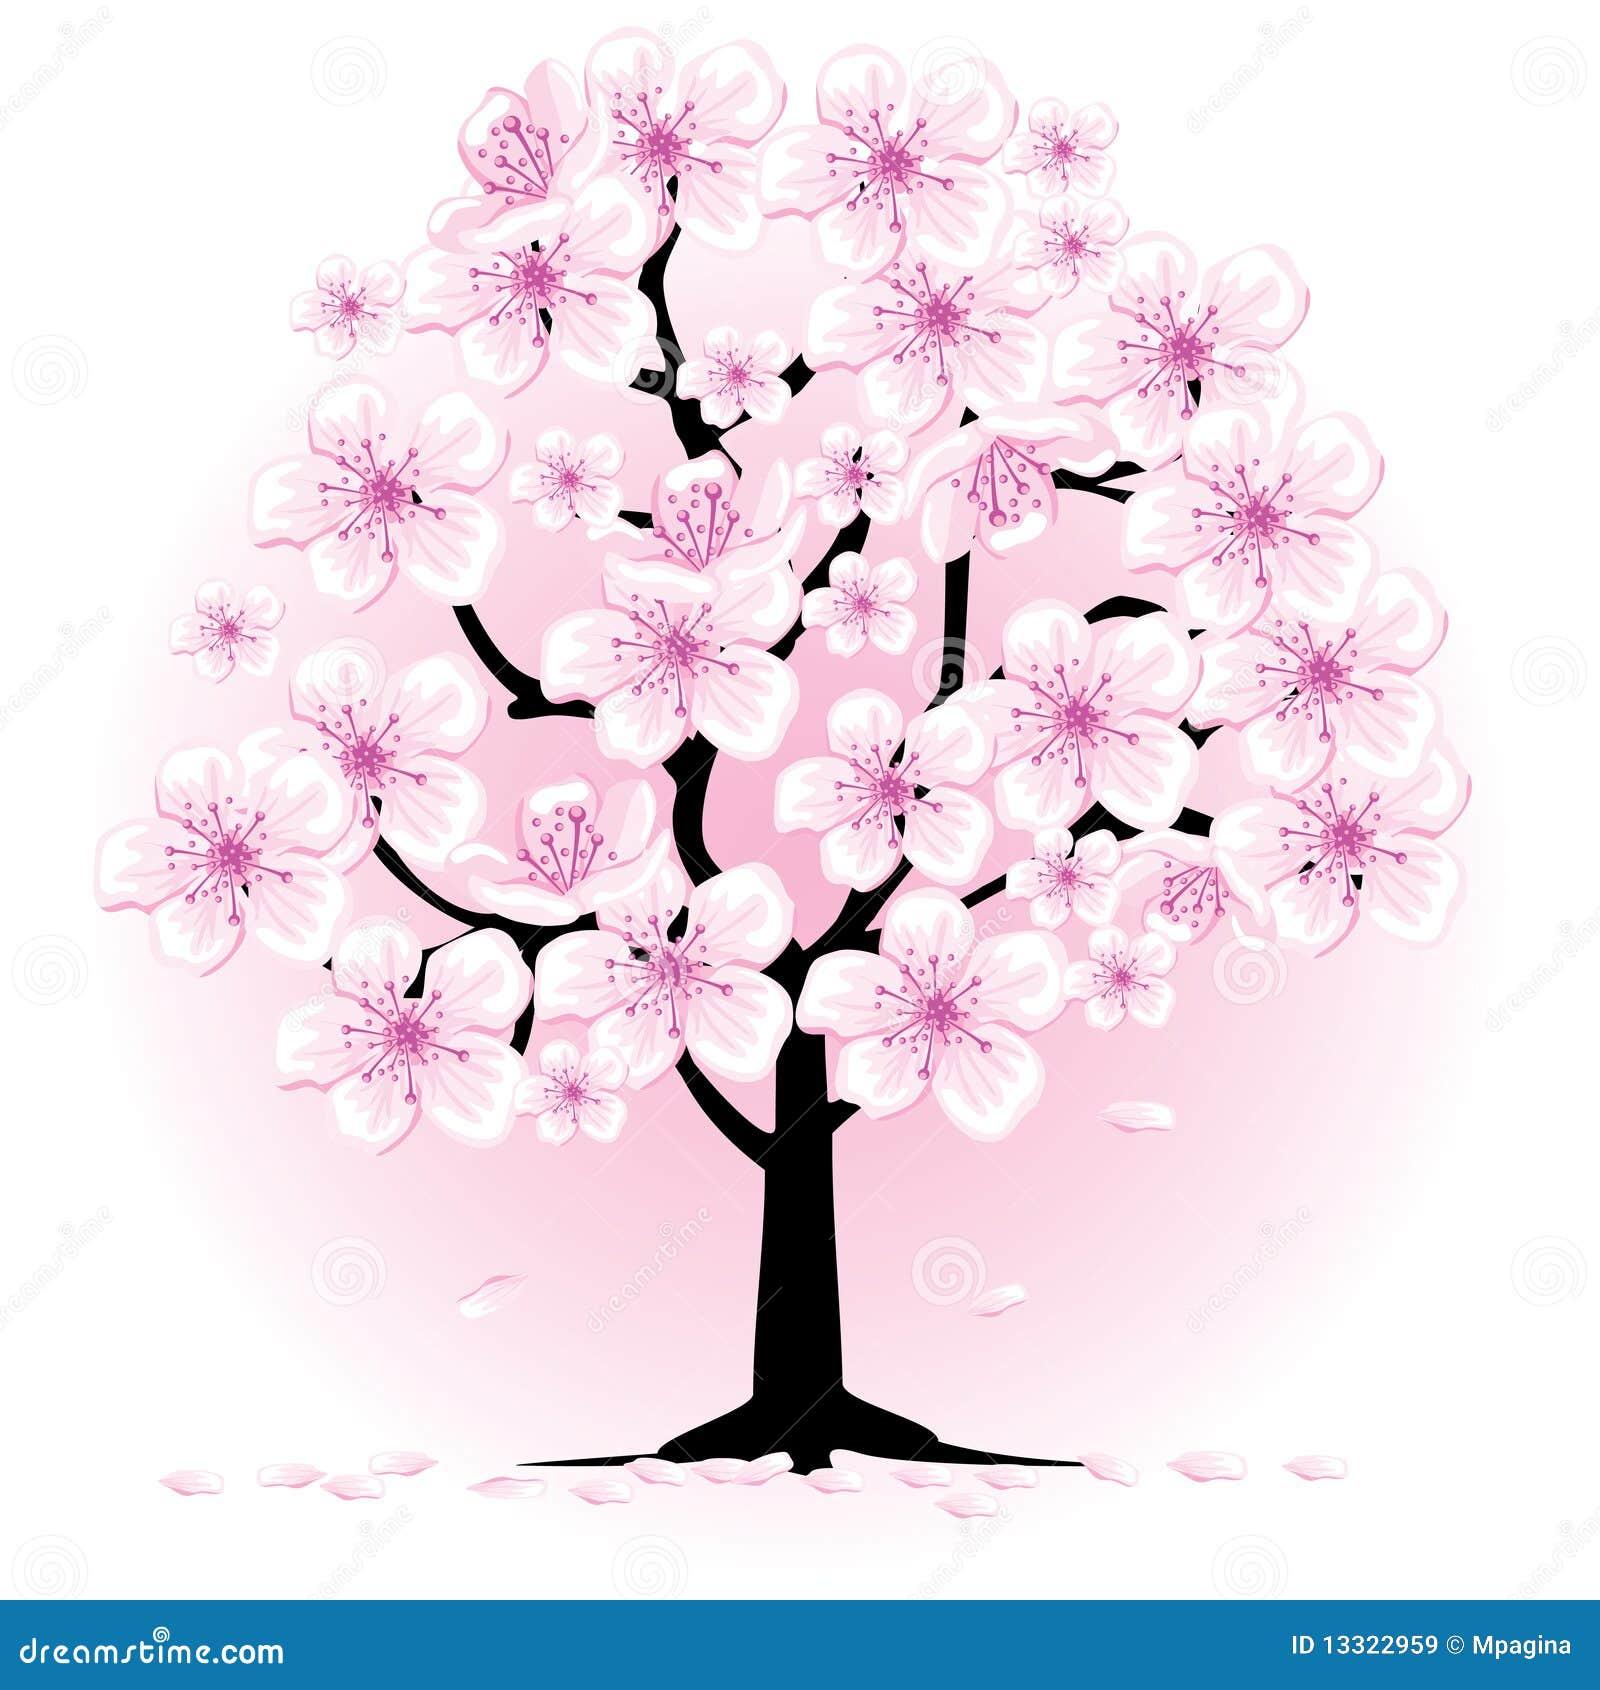 Clipart Of Apple Tree